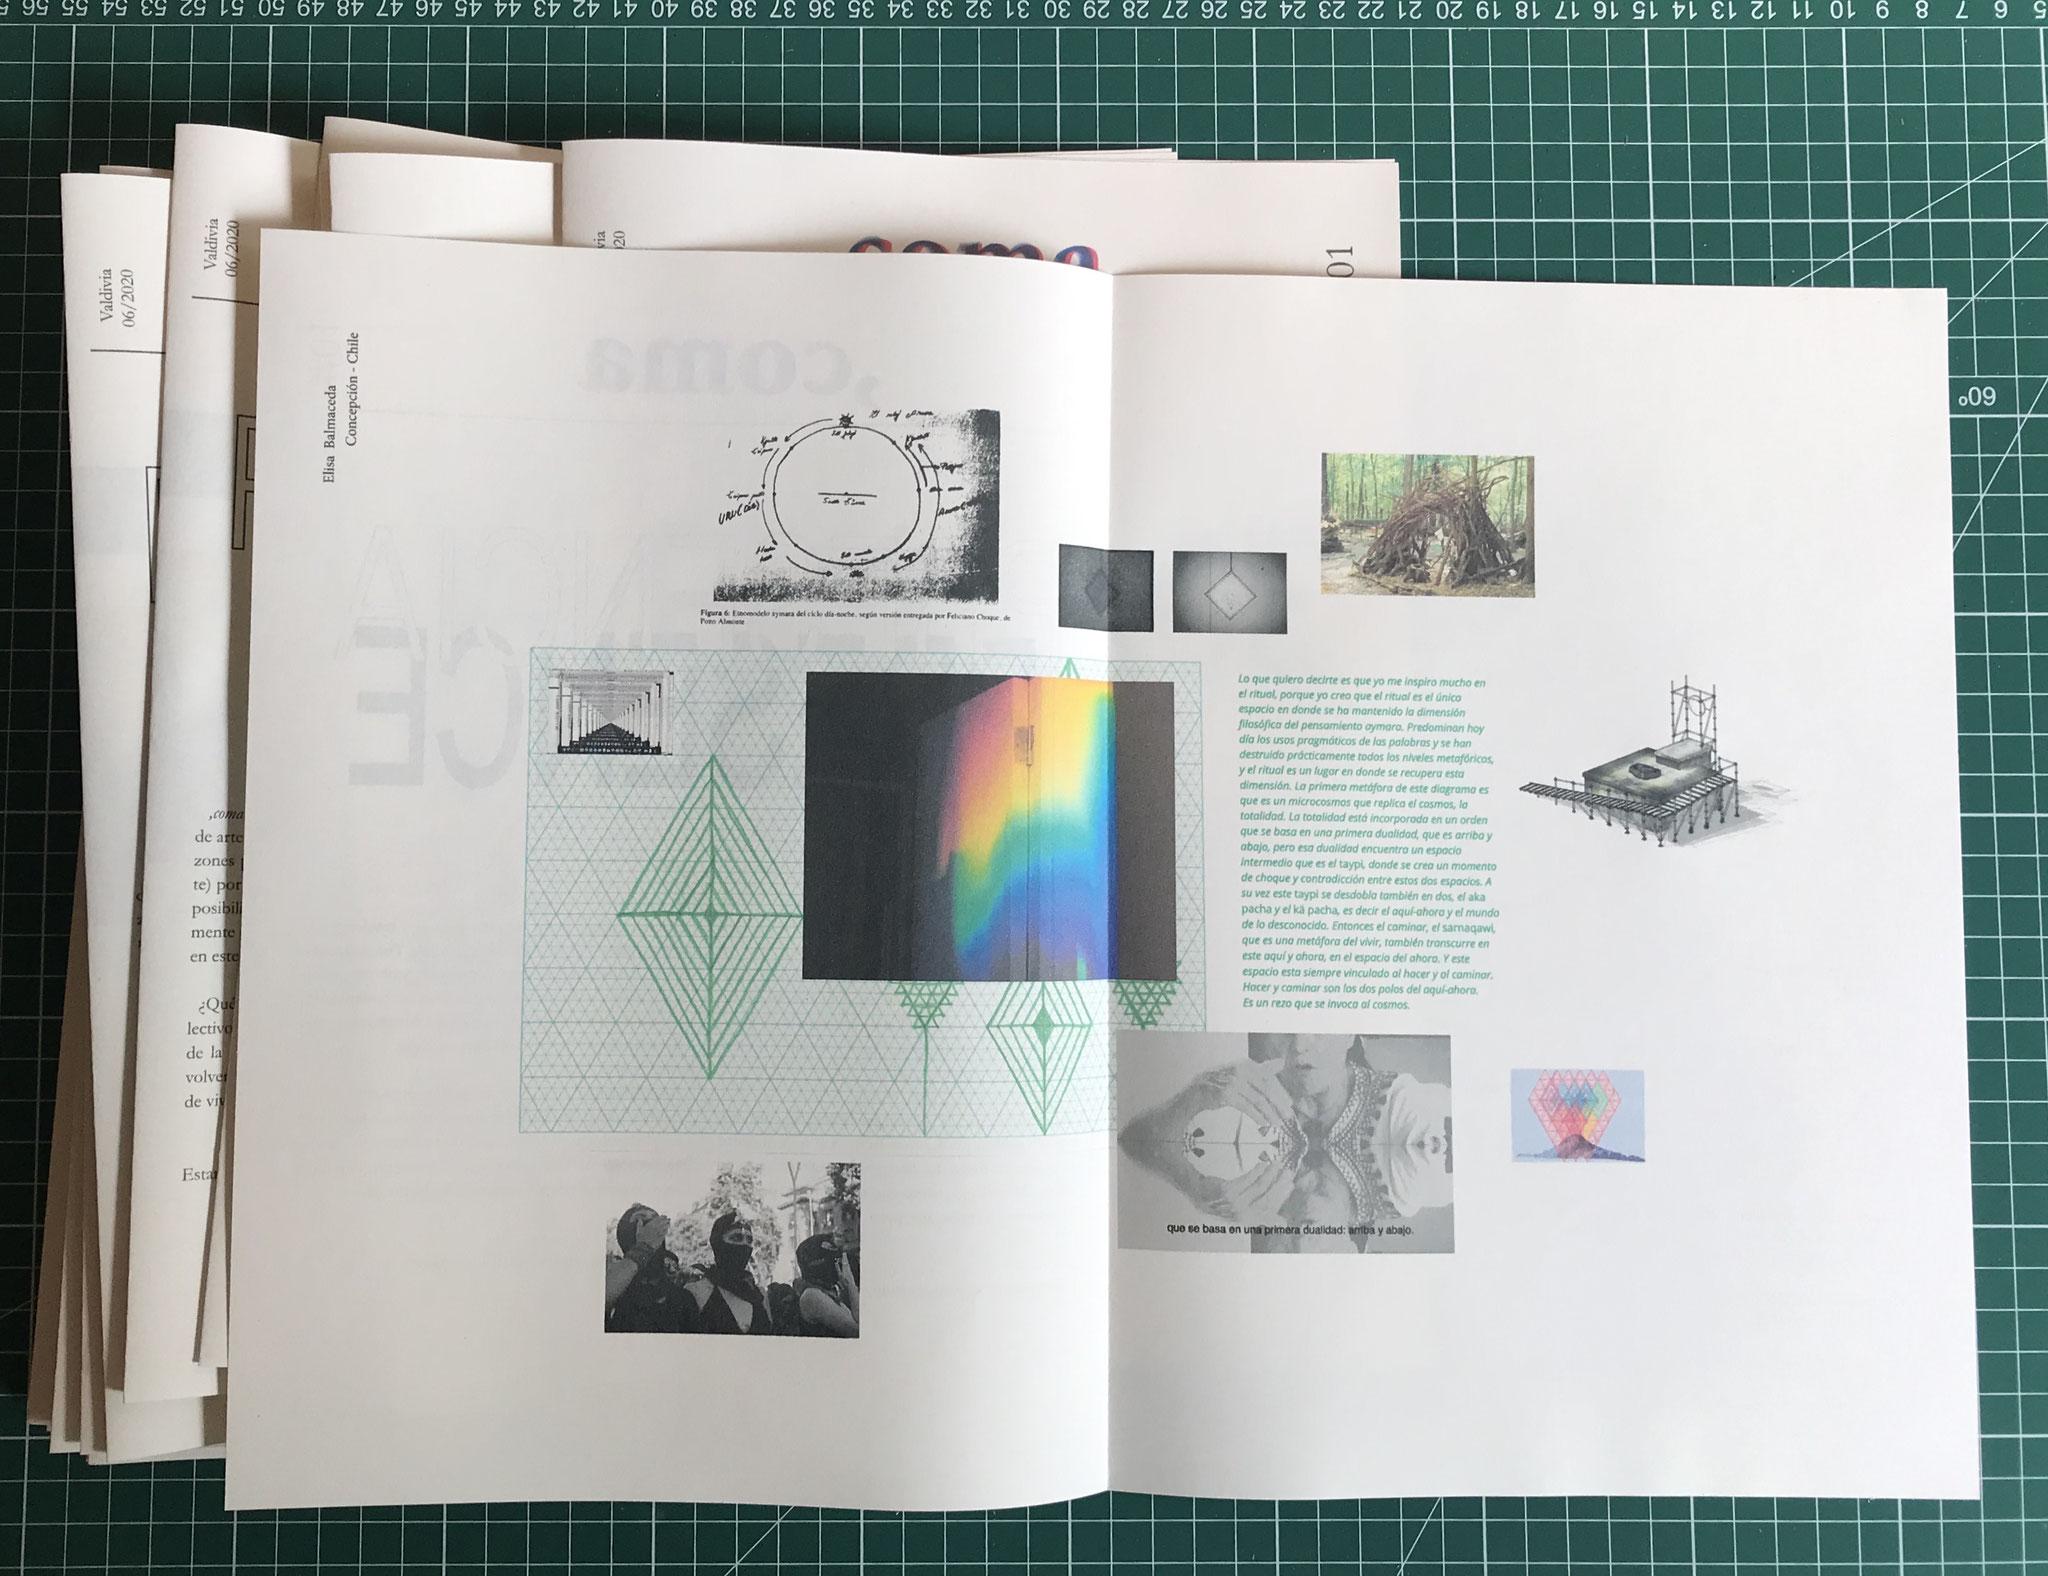 ,coma #1: Presencia/Presence 06/2020